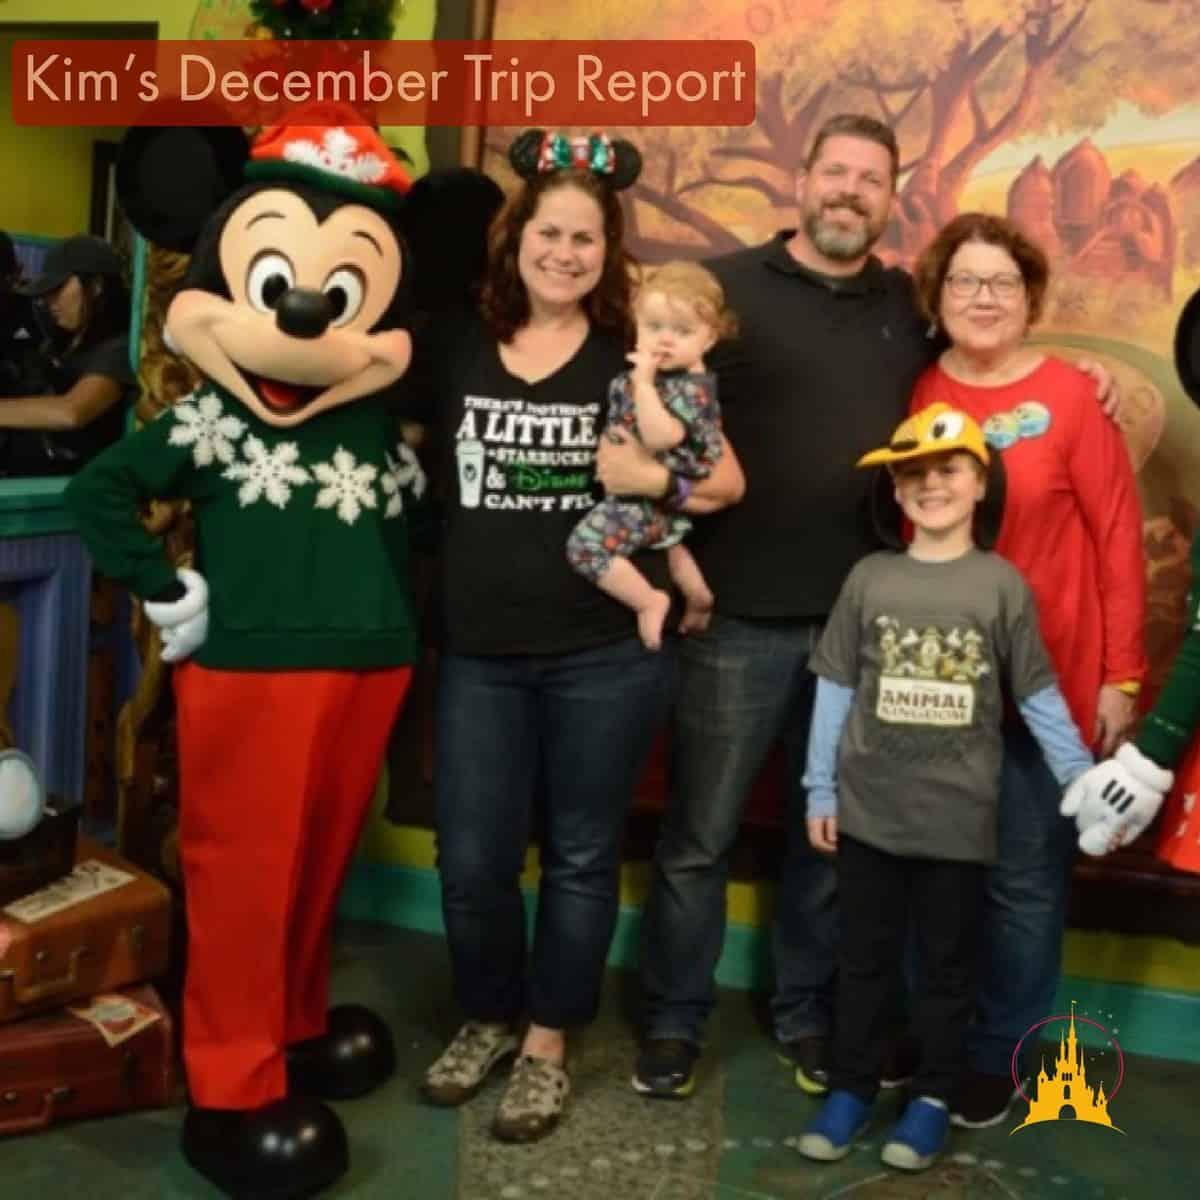 Kim's December trip report